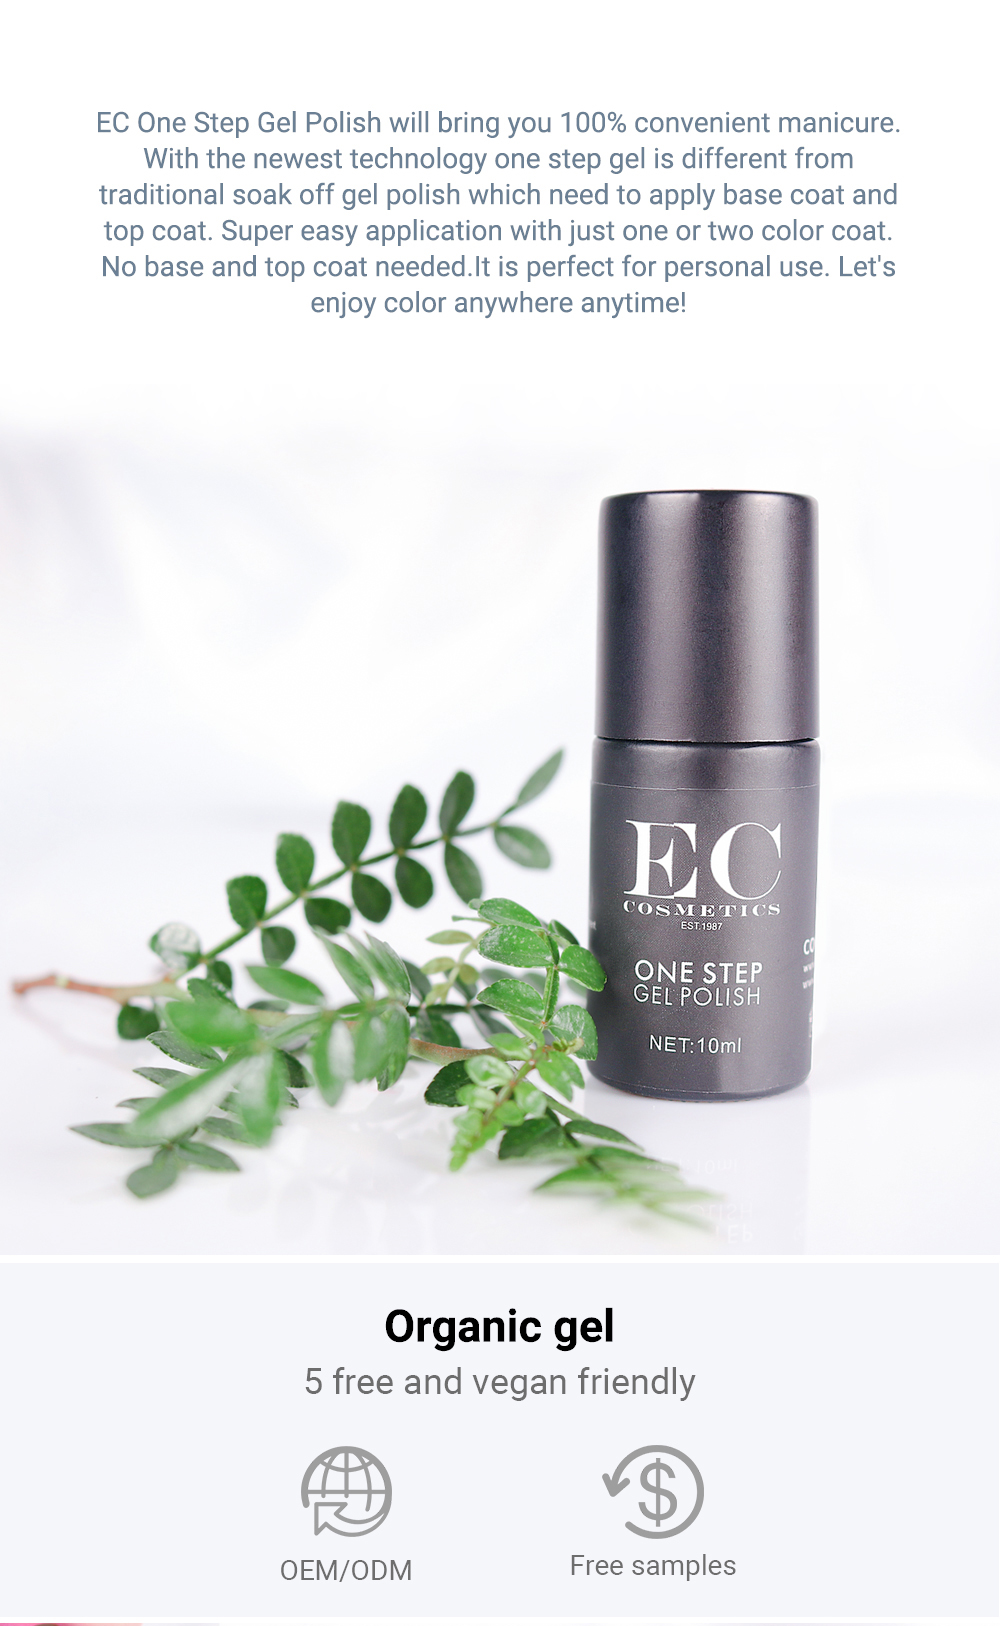 EC china oem hersteller private label großhandel uv einen schritt gel nagellack set